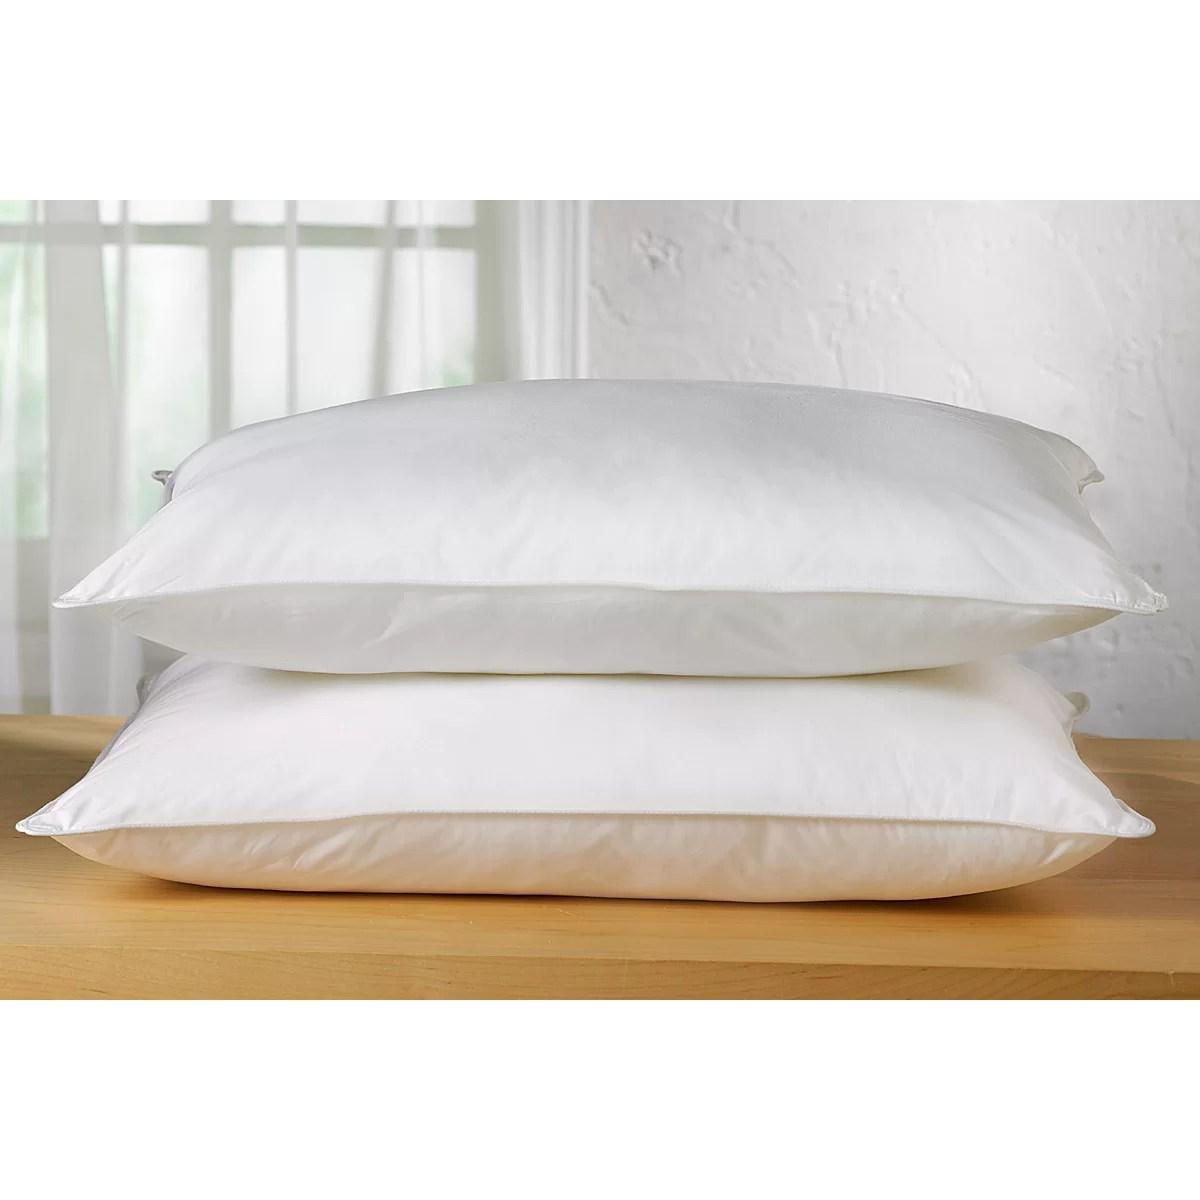 Simple Luxury All Season Down Alternative Pillow Reviews